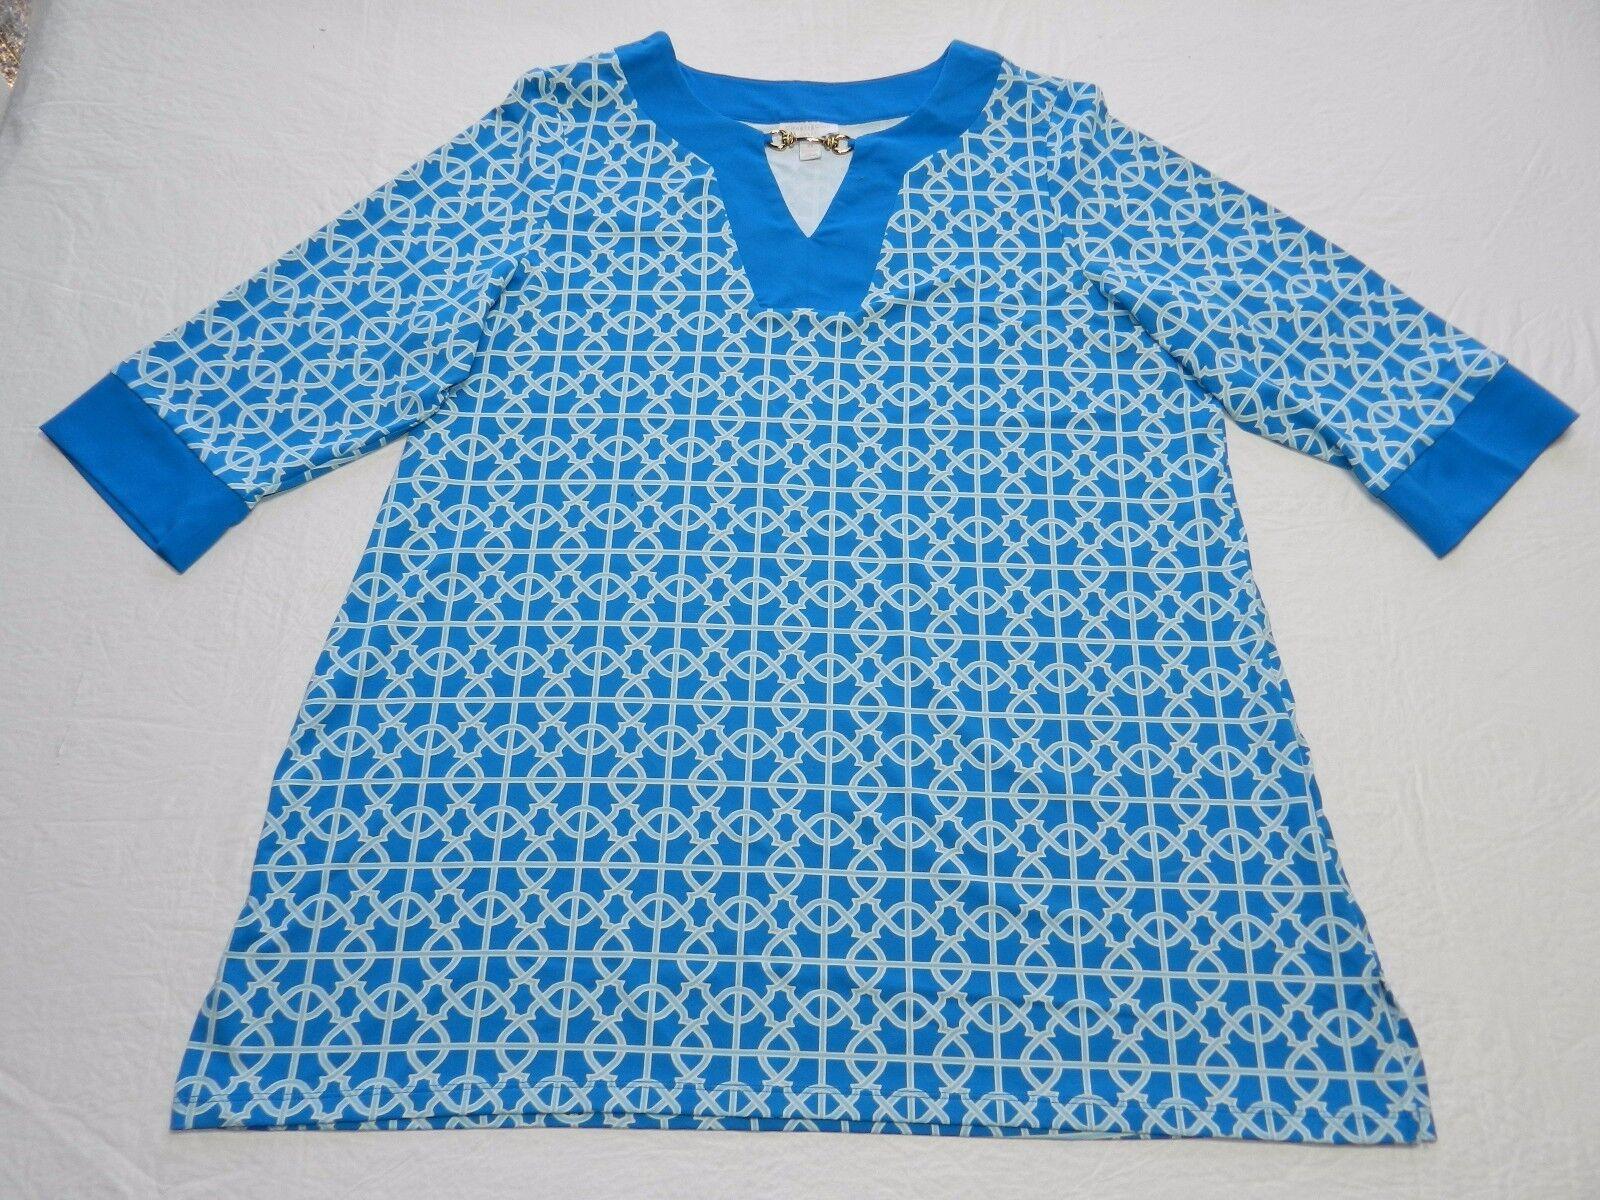 New  79 WOMENS lattice BLOUSE SHIRT TOP tunic = CHARTER CLUB = size 2X = km96